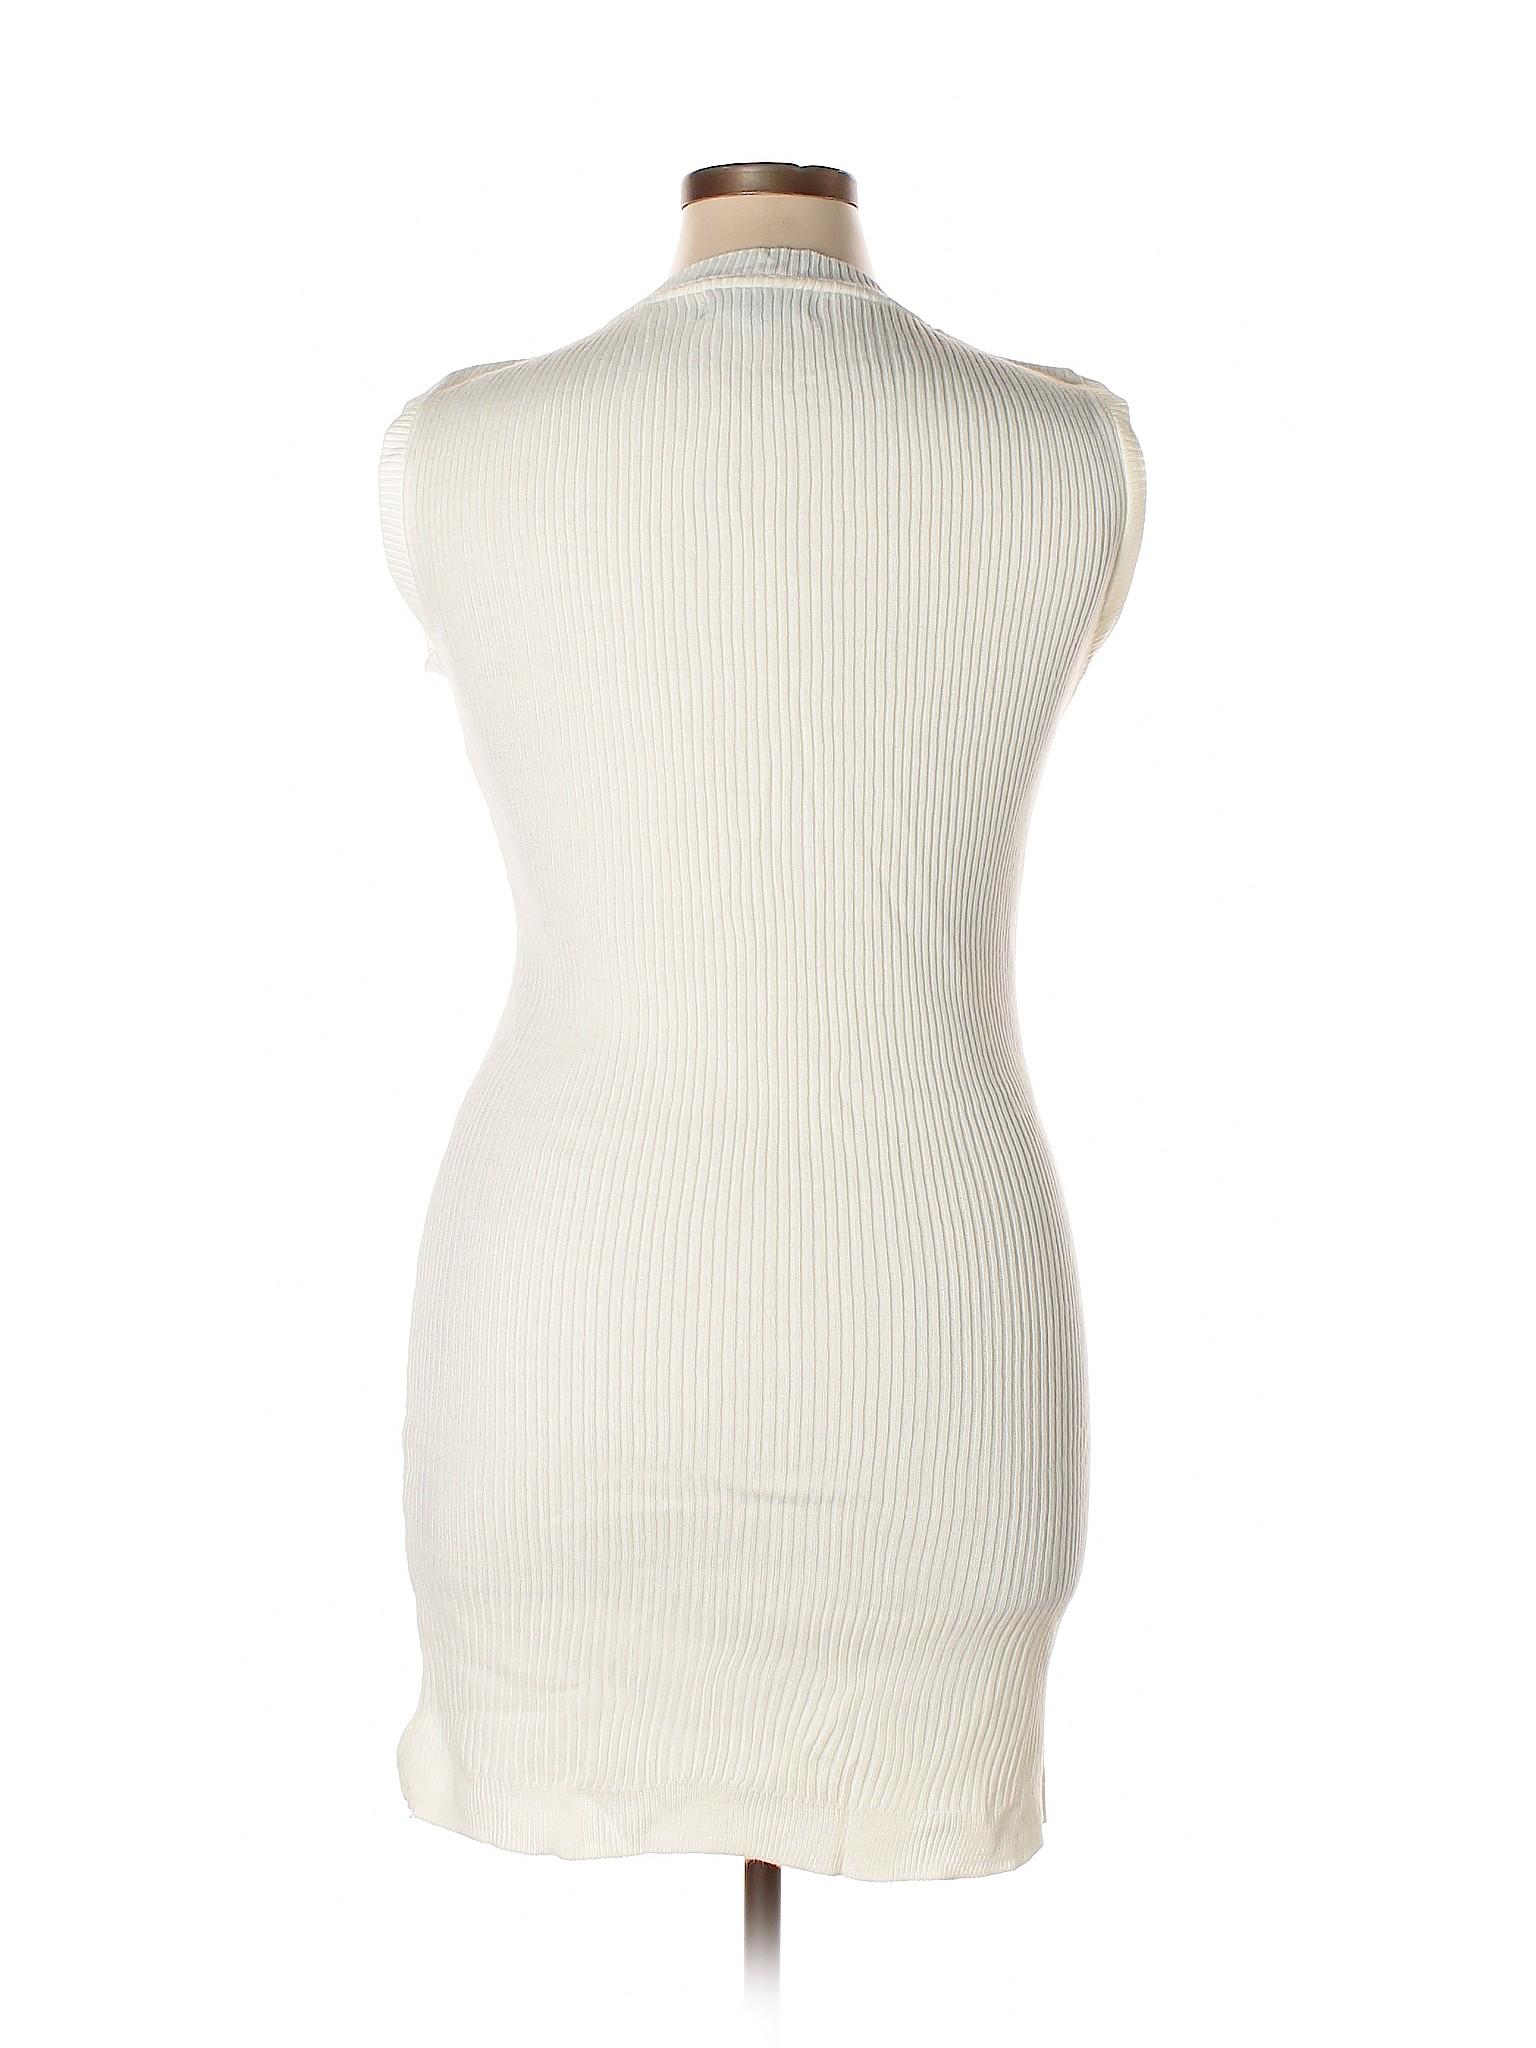 Casual Dress Daisy Street Selling Selling Daisy Street nFxavP1wF